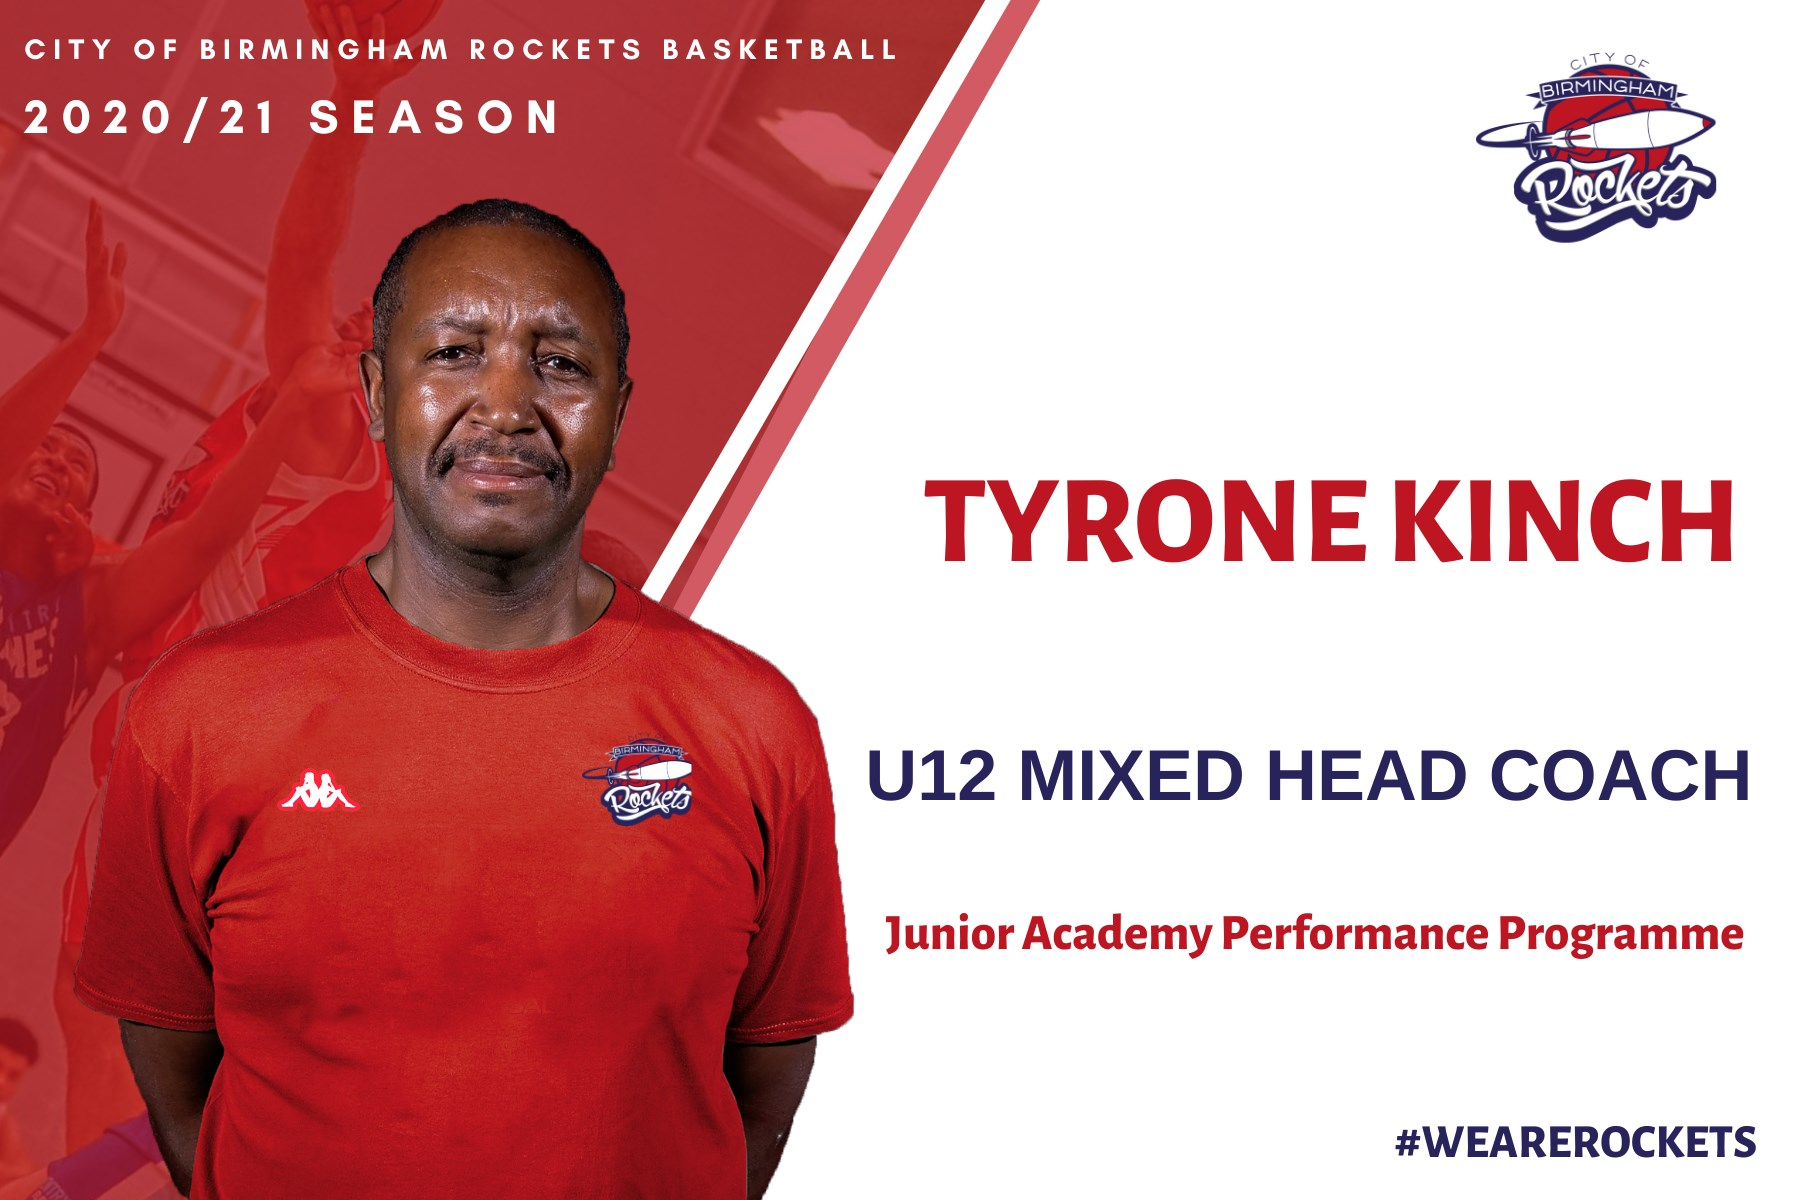 Tyrone Kinch